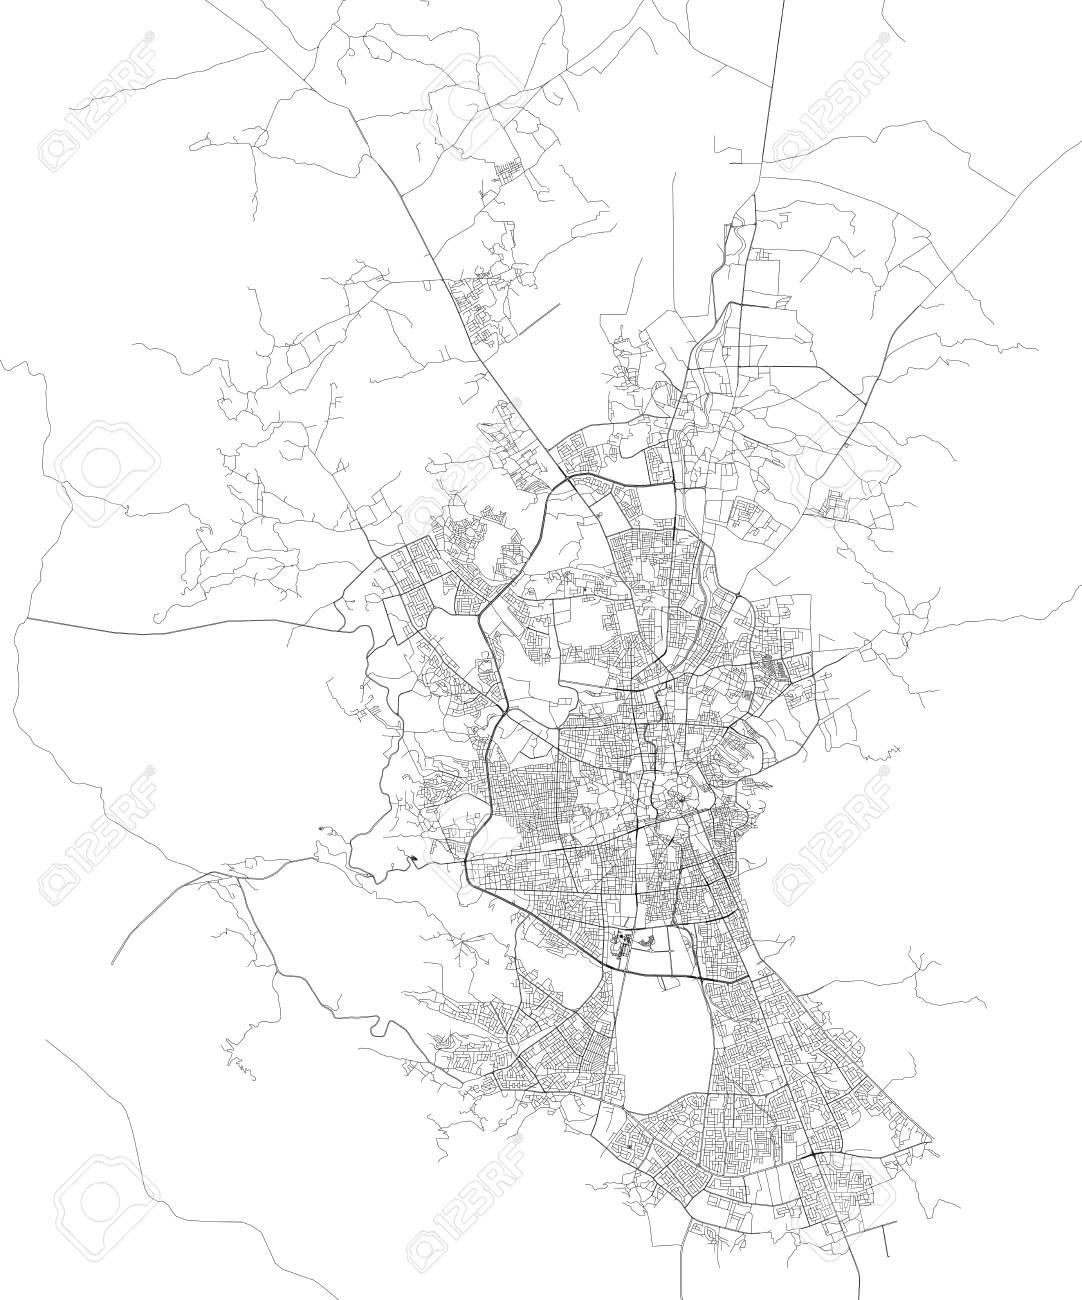 Satellite map of Sana? A, Yemen, city streets. Street map and.. on detailed map of yemen, road map of yemen, outline map of yemen, terrain map of yemen, political map of yemen, physical map of yemen, topographic map of yemen,